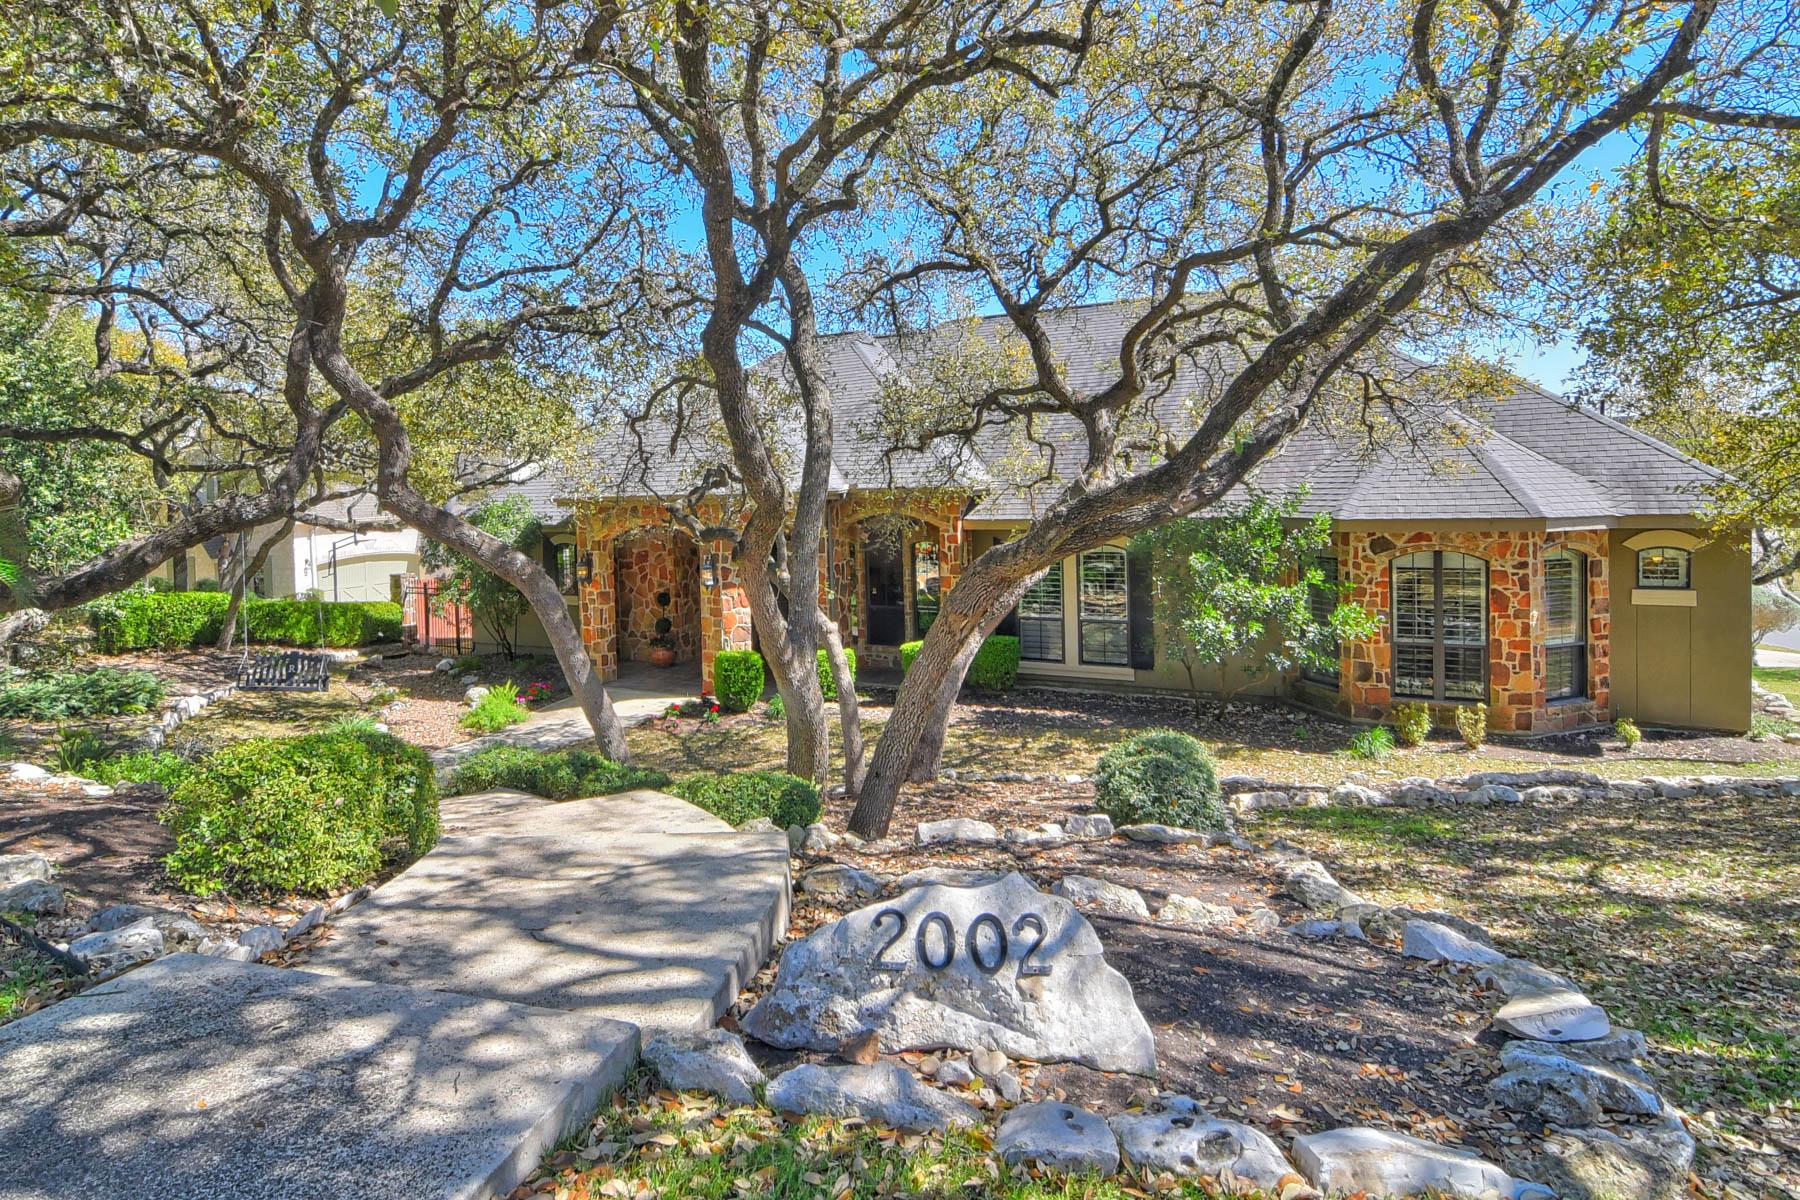 Single Family Home for Sale at Classic Elegance in Summerglen 2002 Sawgrass Ridge Summerglen, San Antonio, Texas, 78260 United States